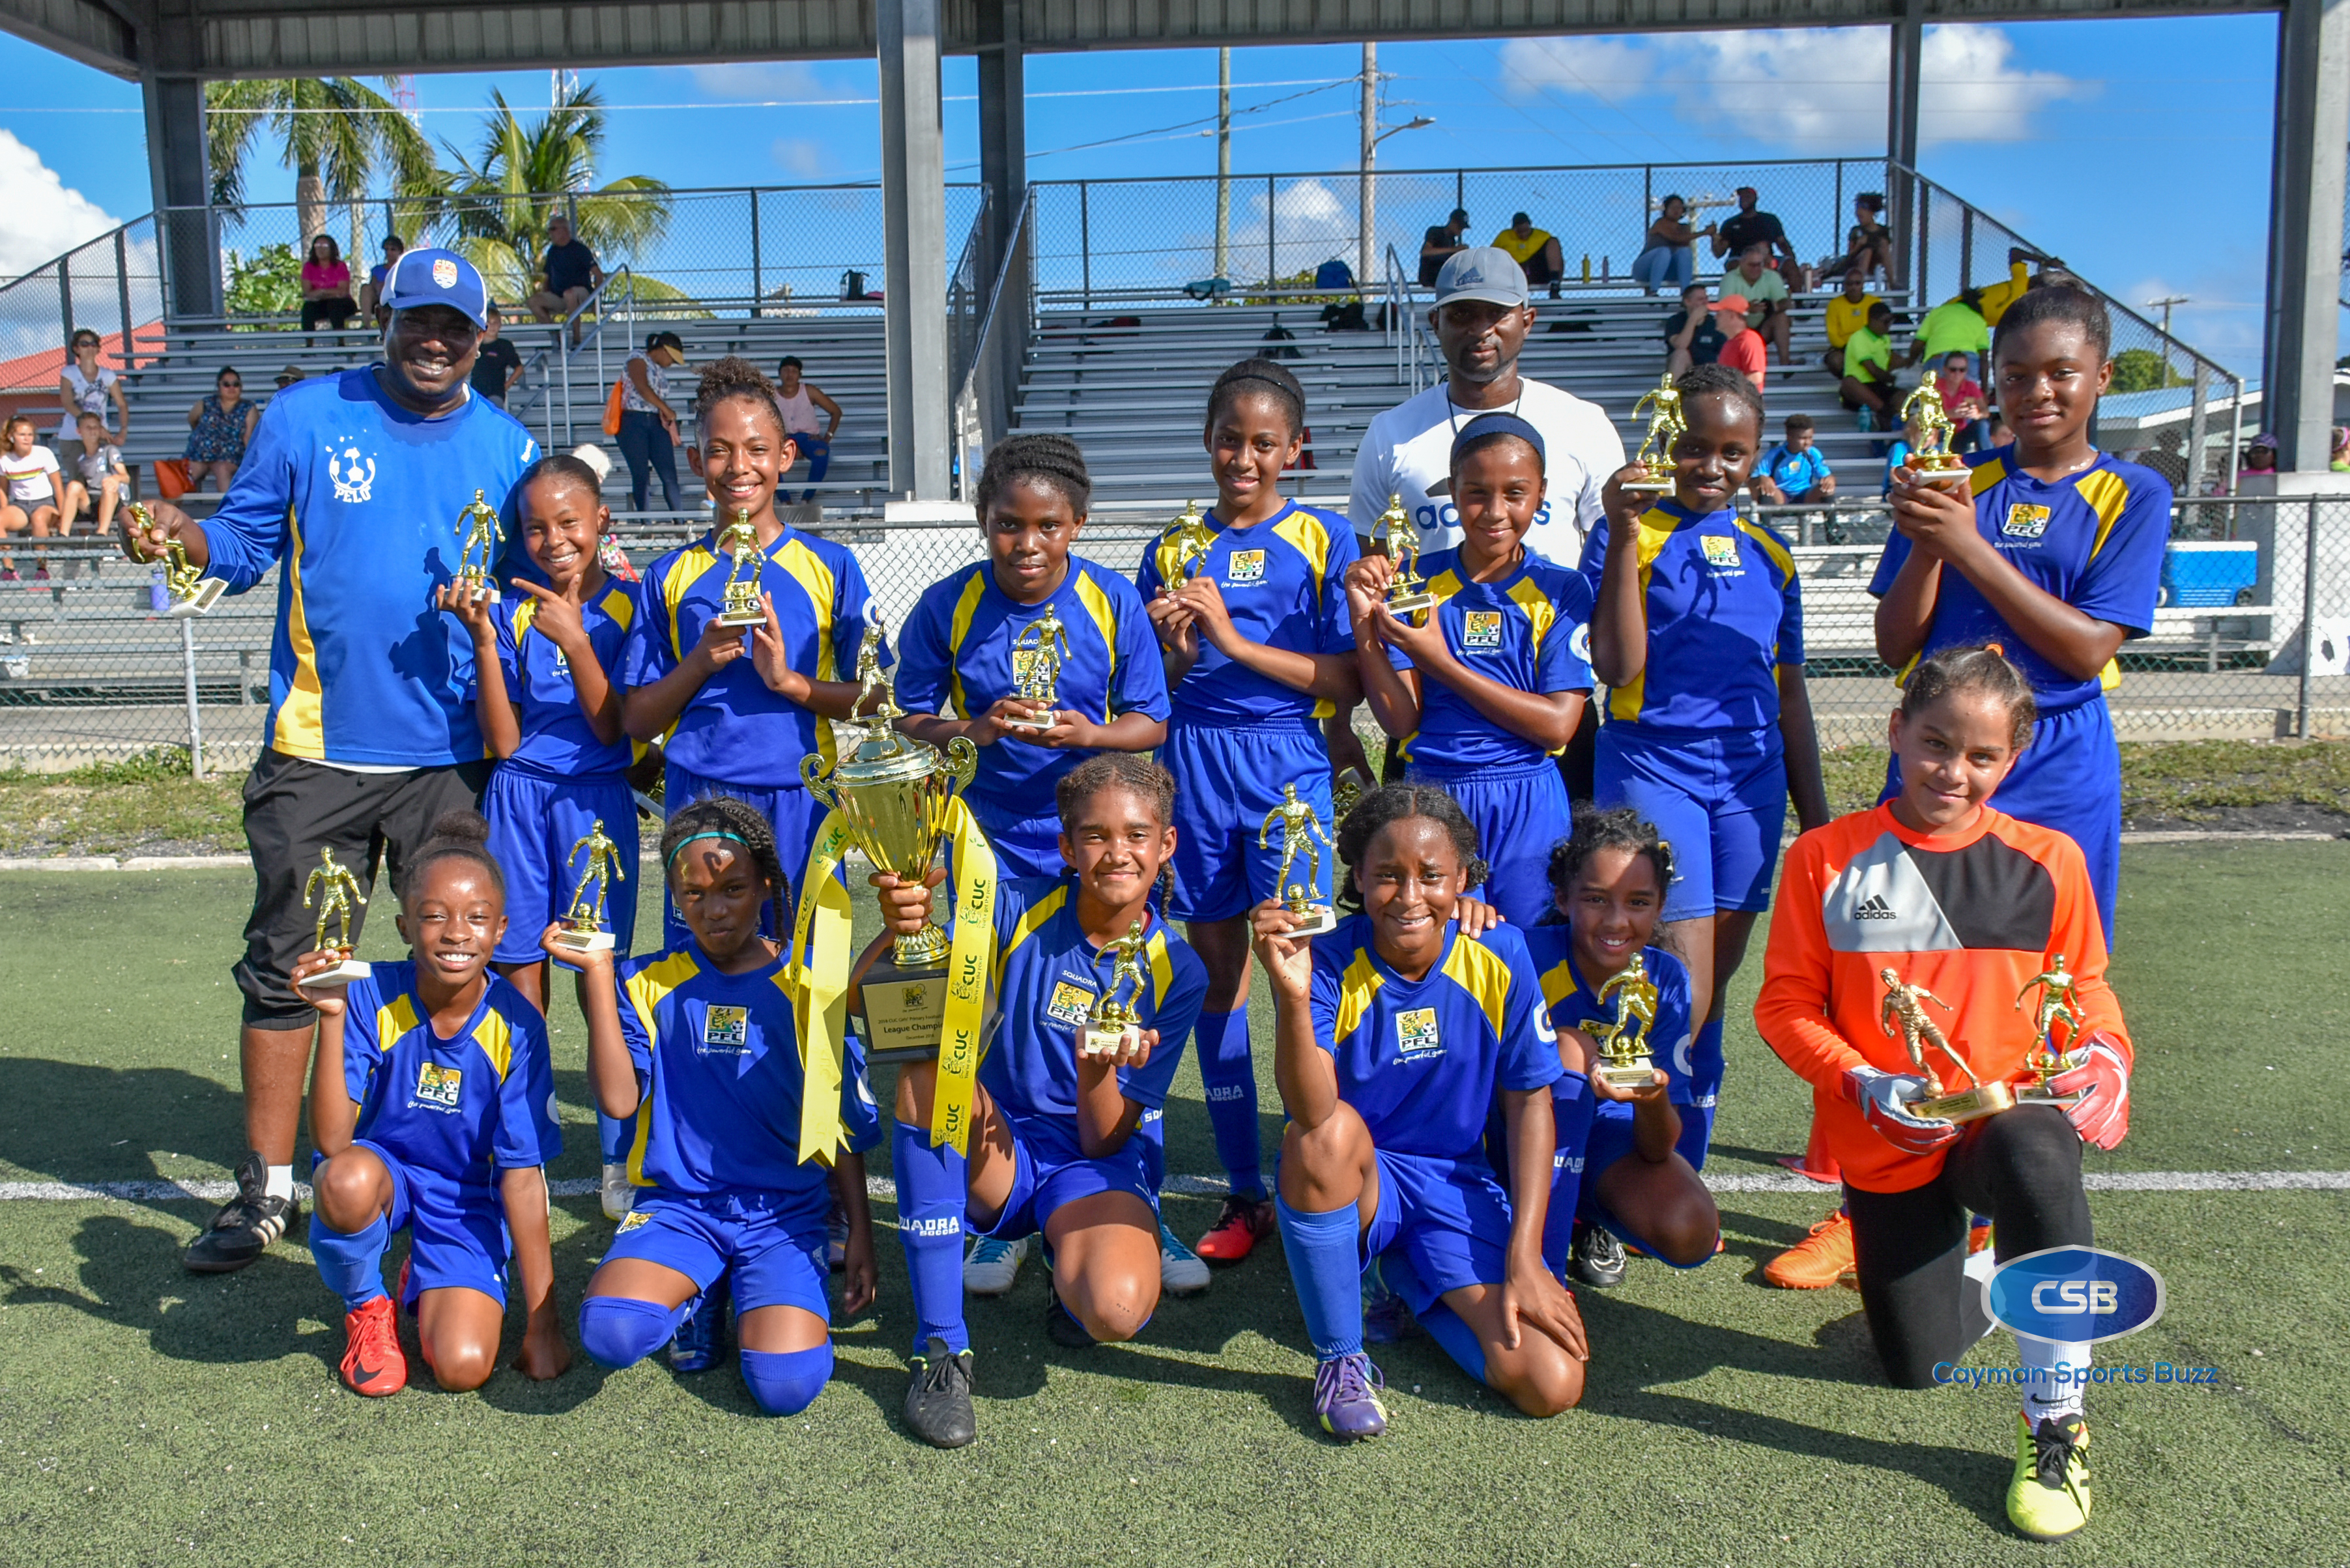 2018 CUC GPFL U11 Champions - Savannah Primary School